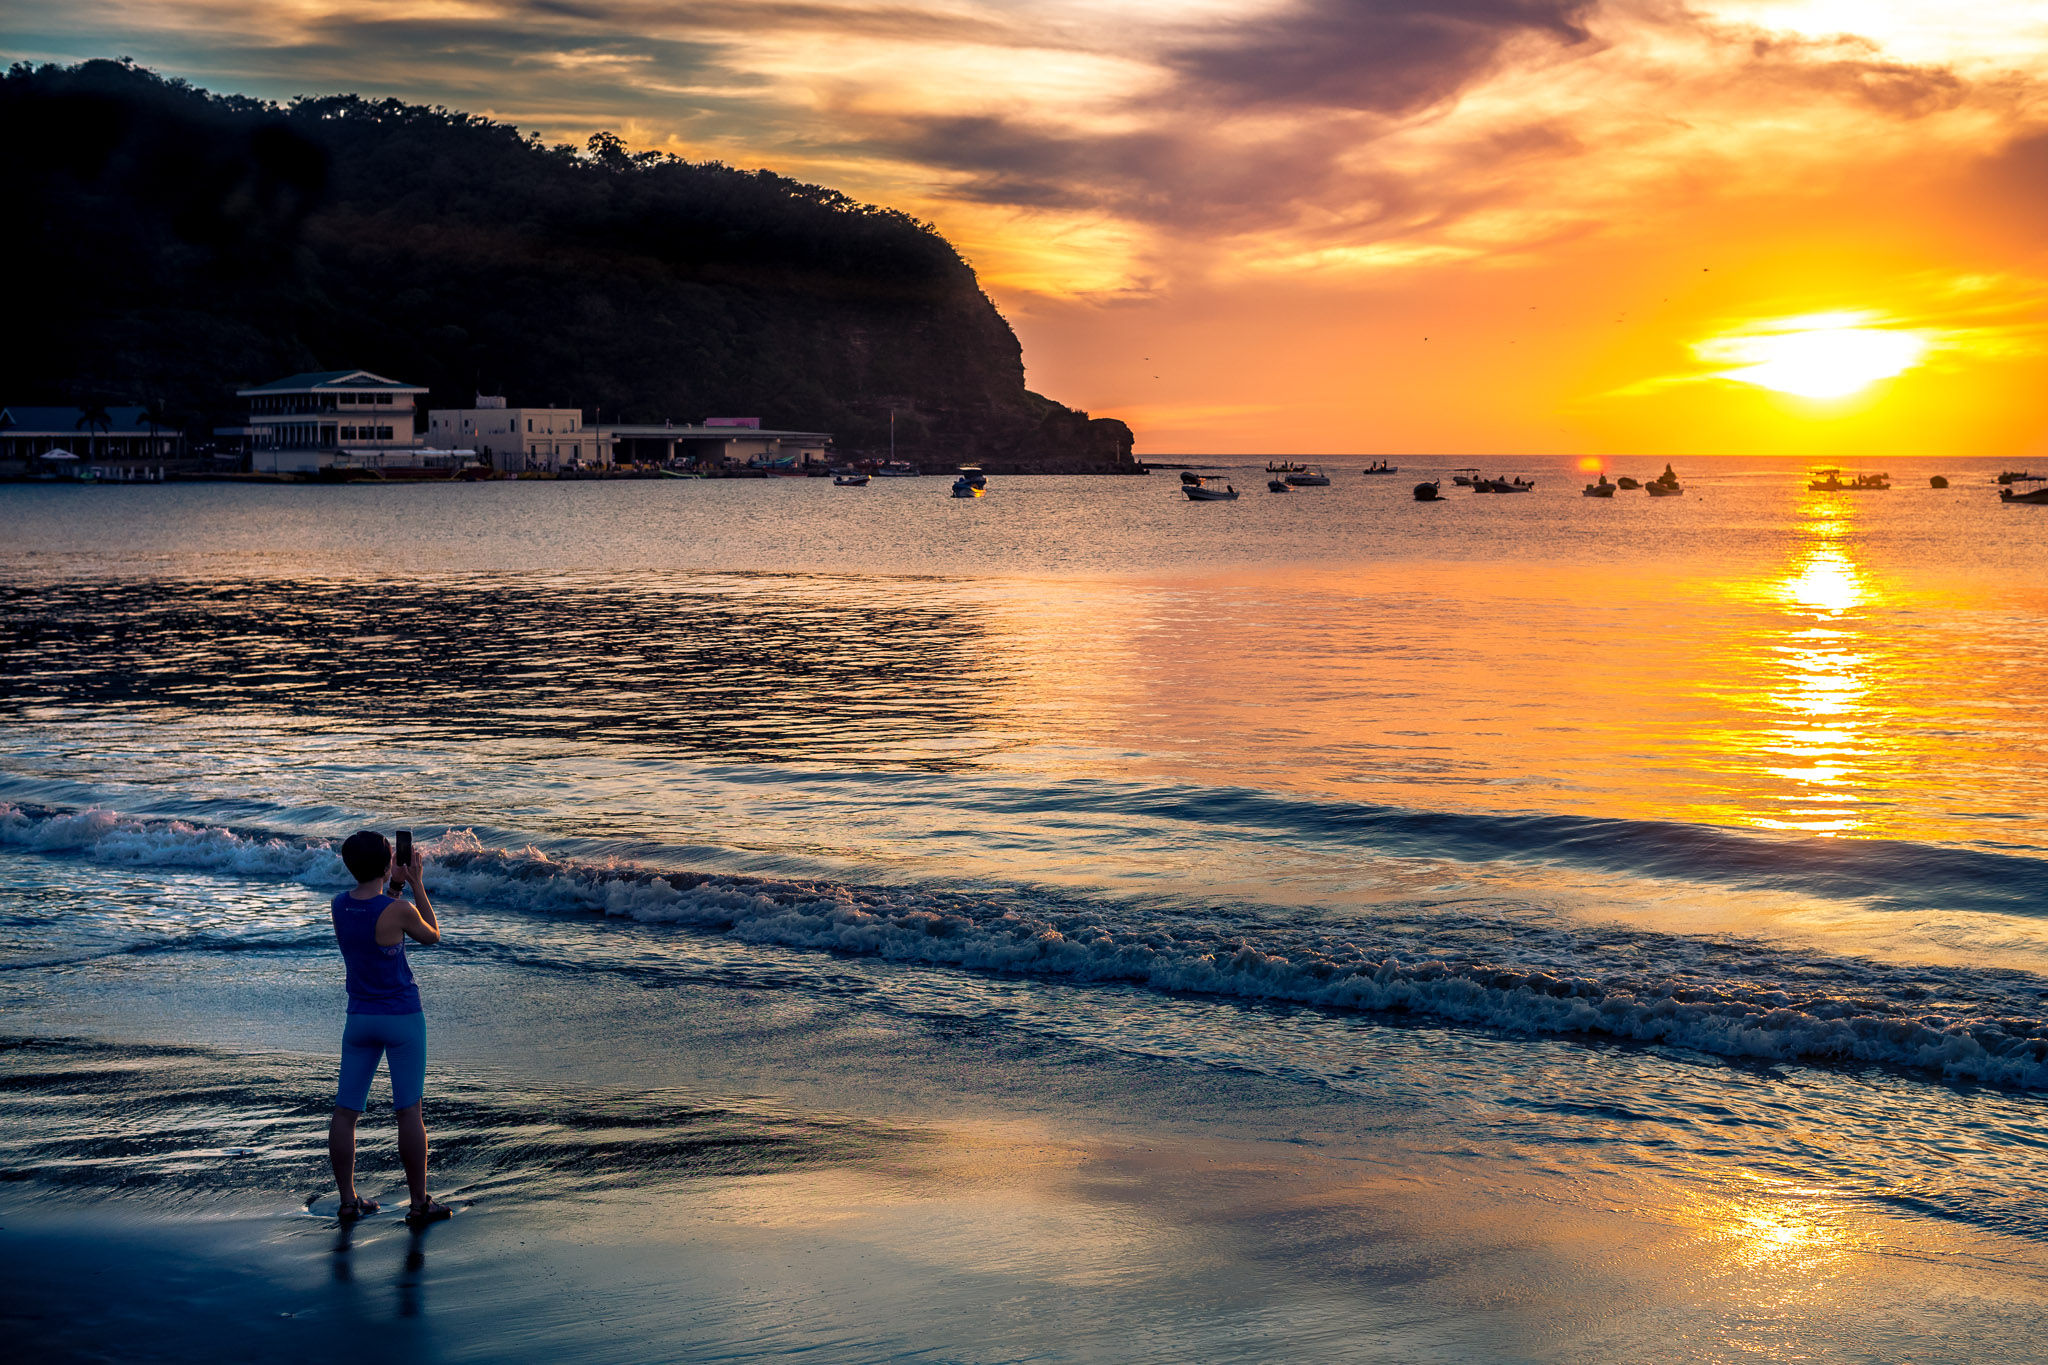 Sunset in San Juan del Sur. Photo credit: Jim Hill